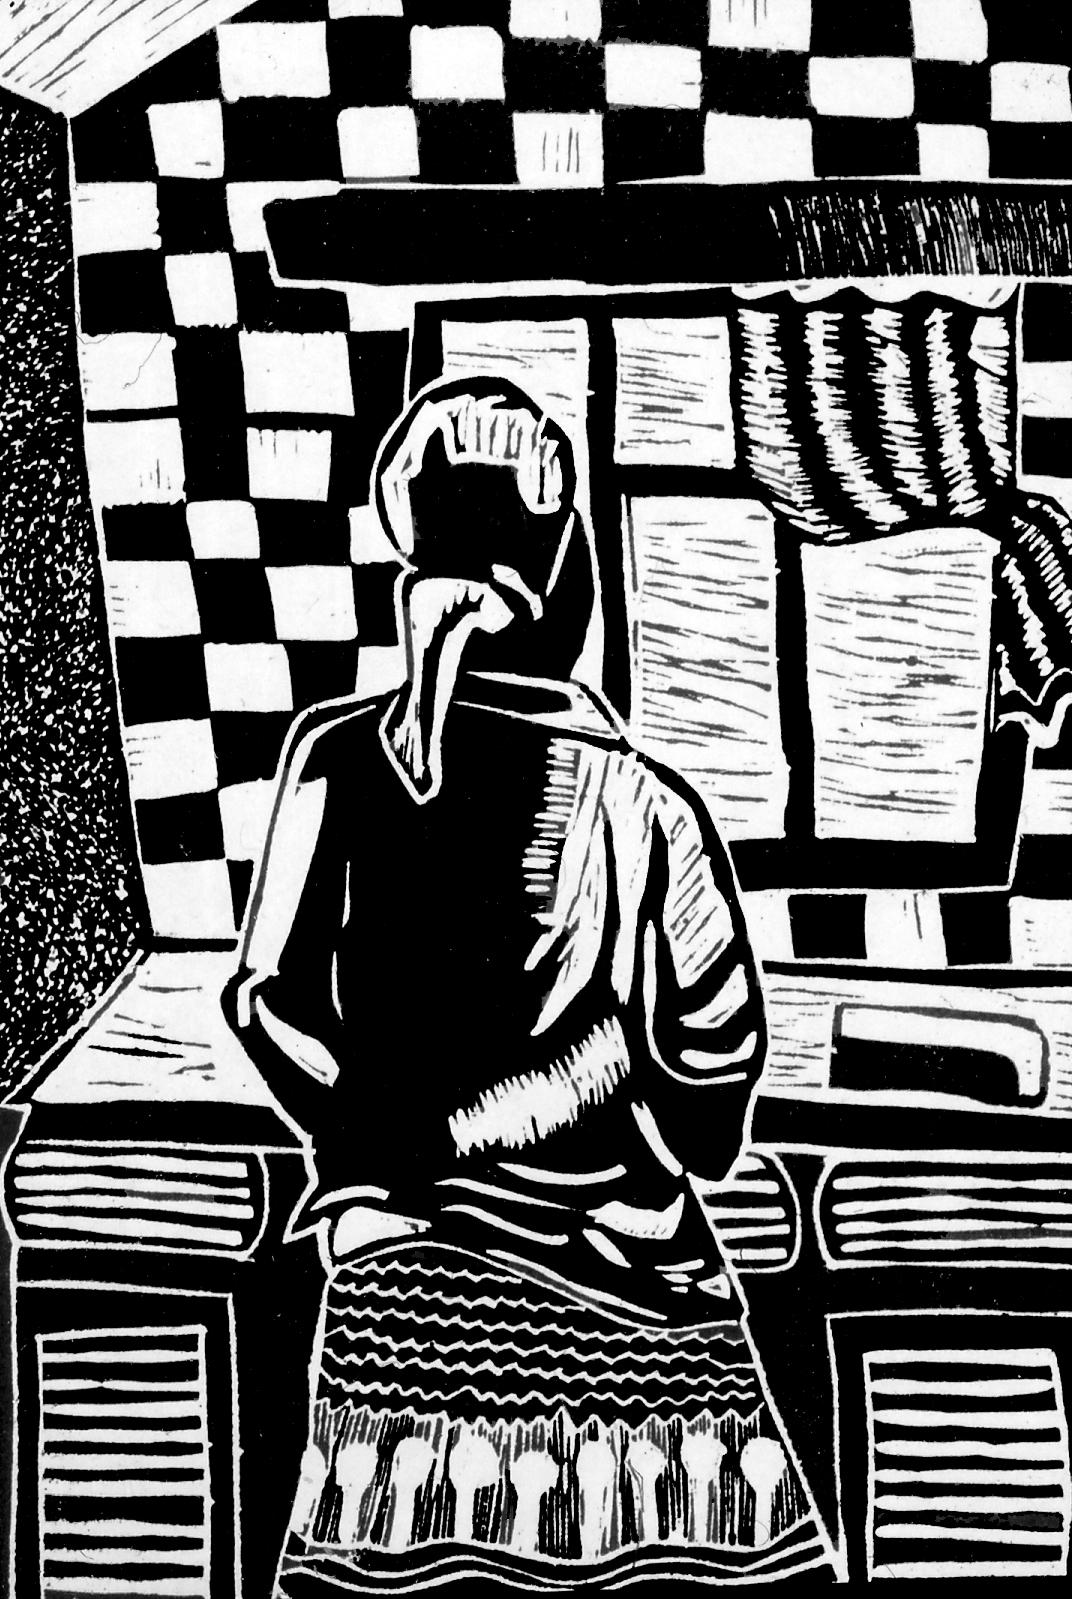 David Hlongwane.Domestic Worker, 1986. Linocut